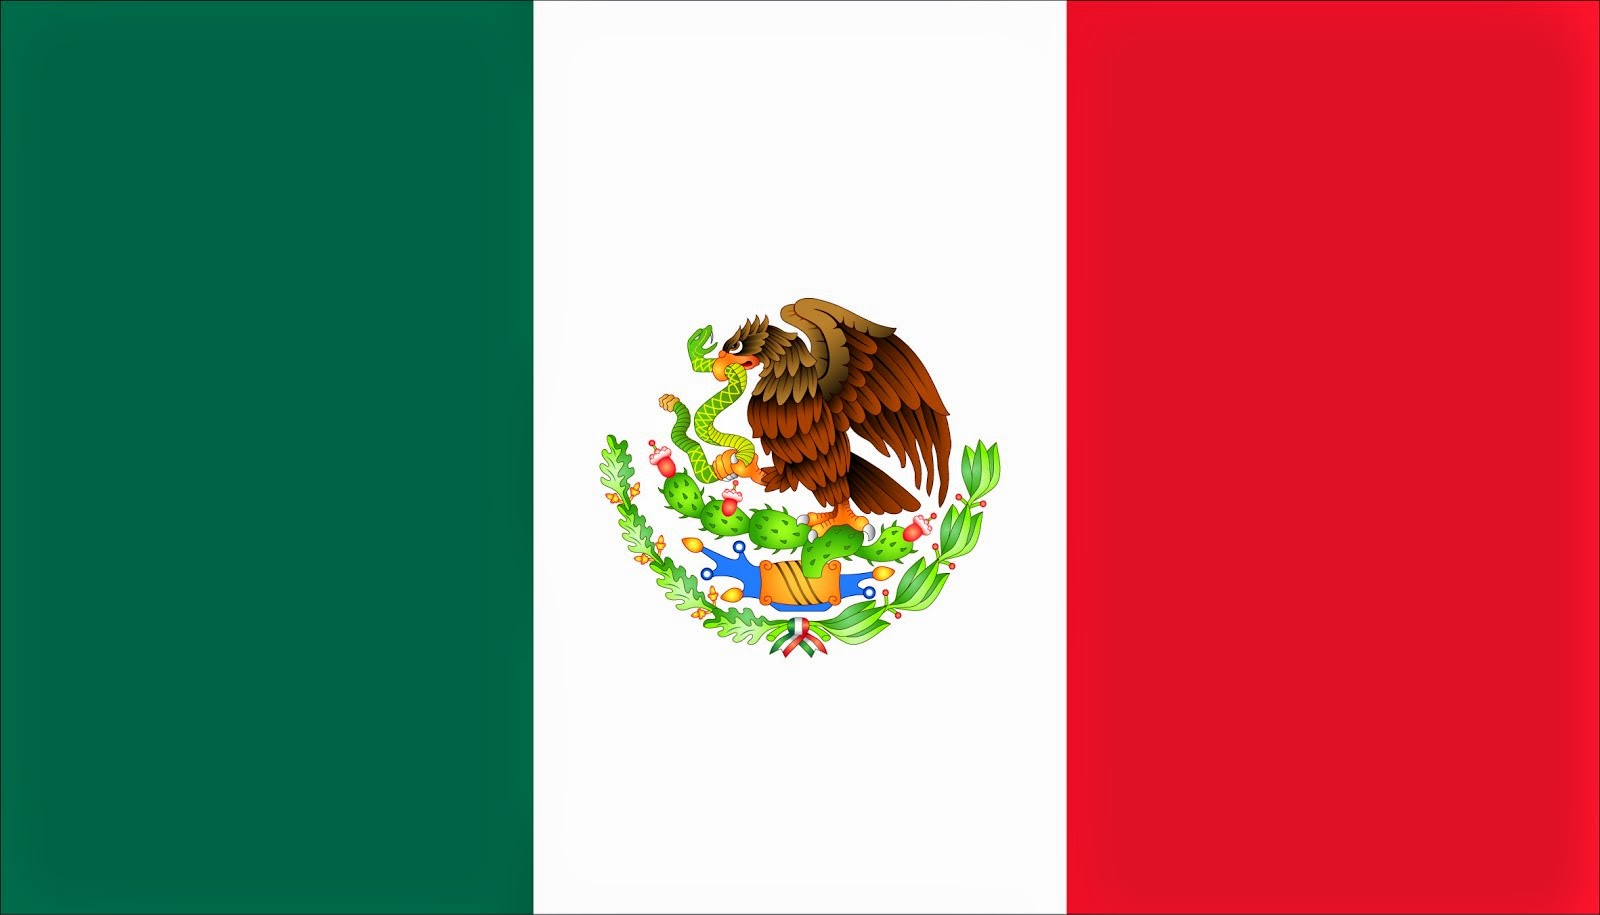 1.- FEDCODIM - NACIONAL MÉXICO - MIEMBRO PLENO CIDI - PRESIDENCIA IBEROAMERICANA CIDI